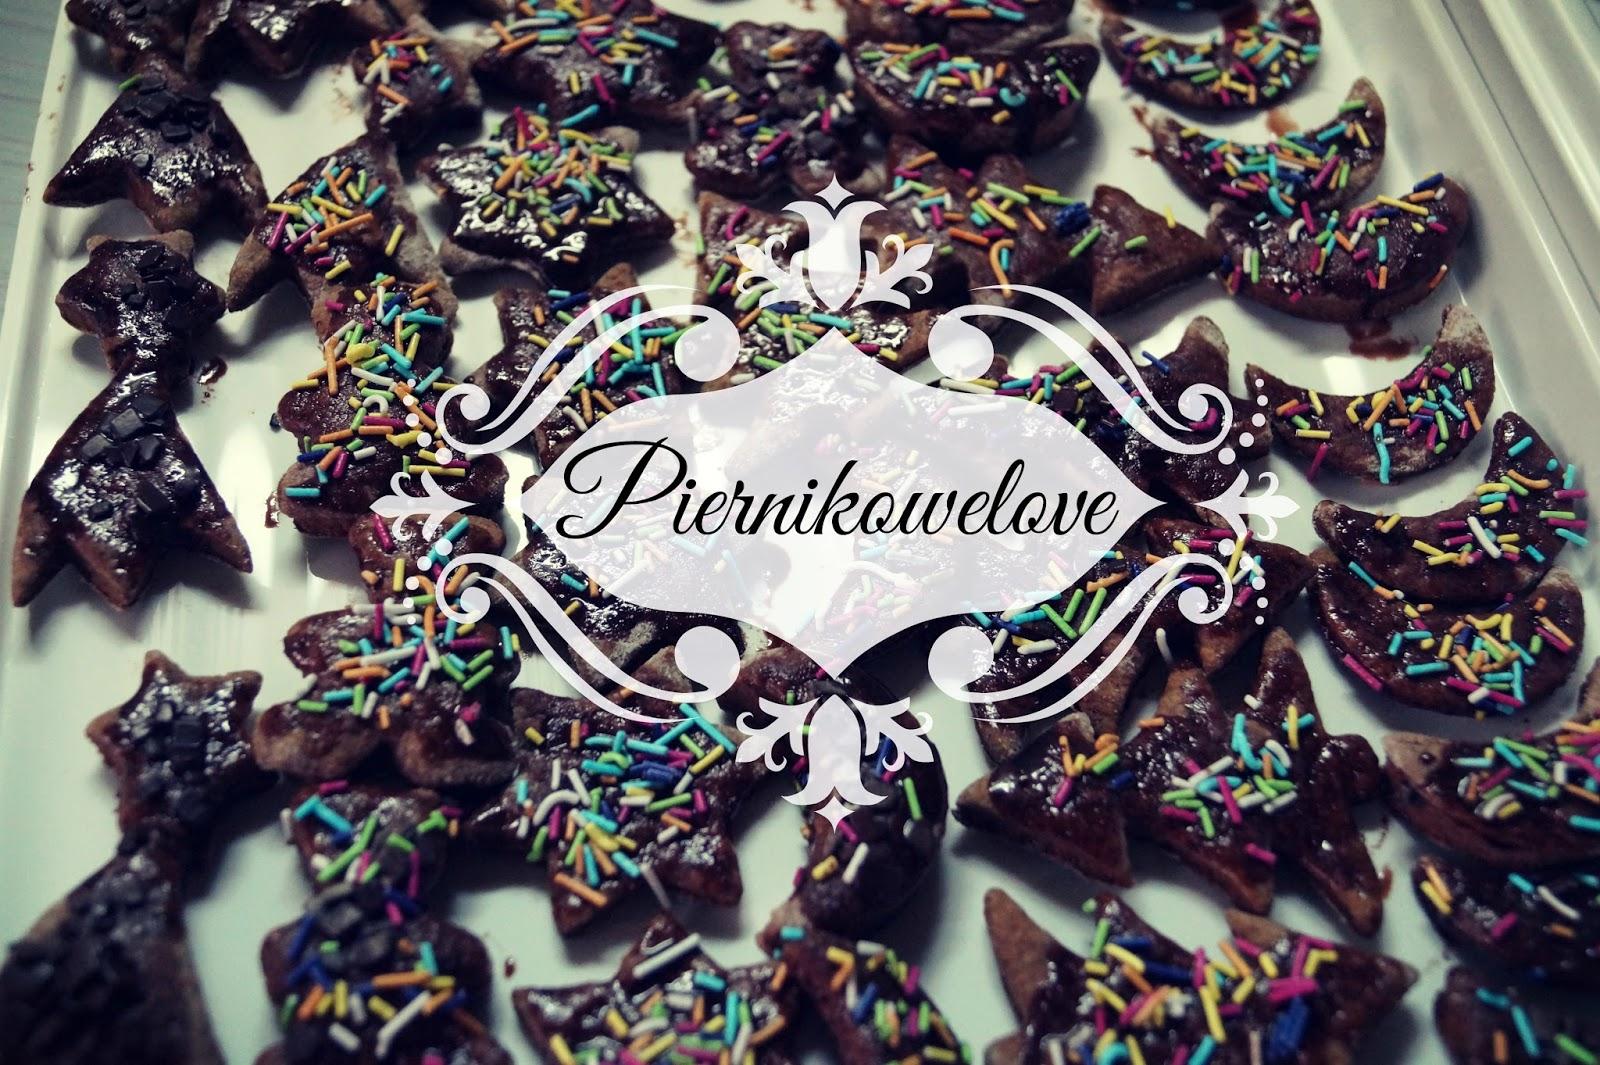 48. Piernikowelove